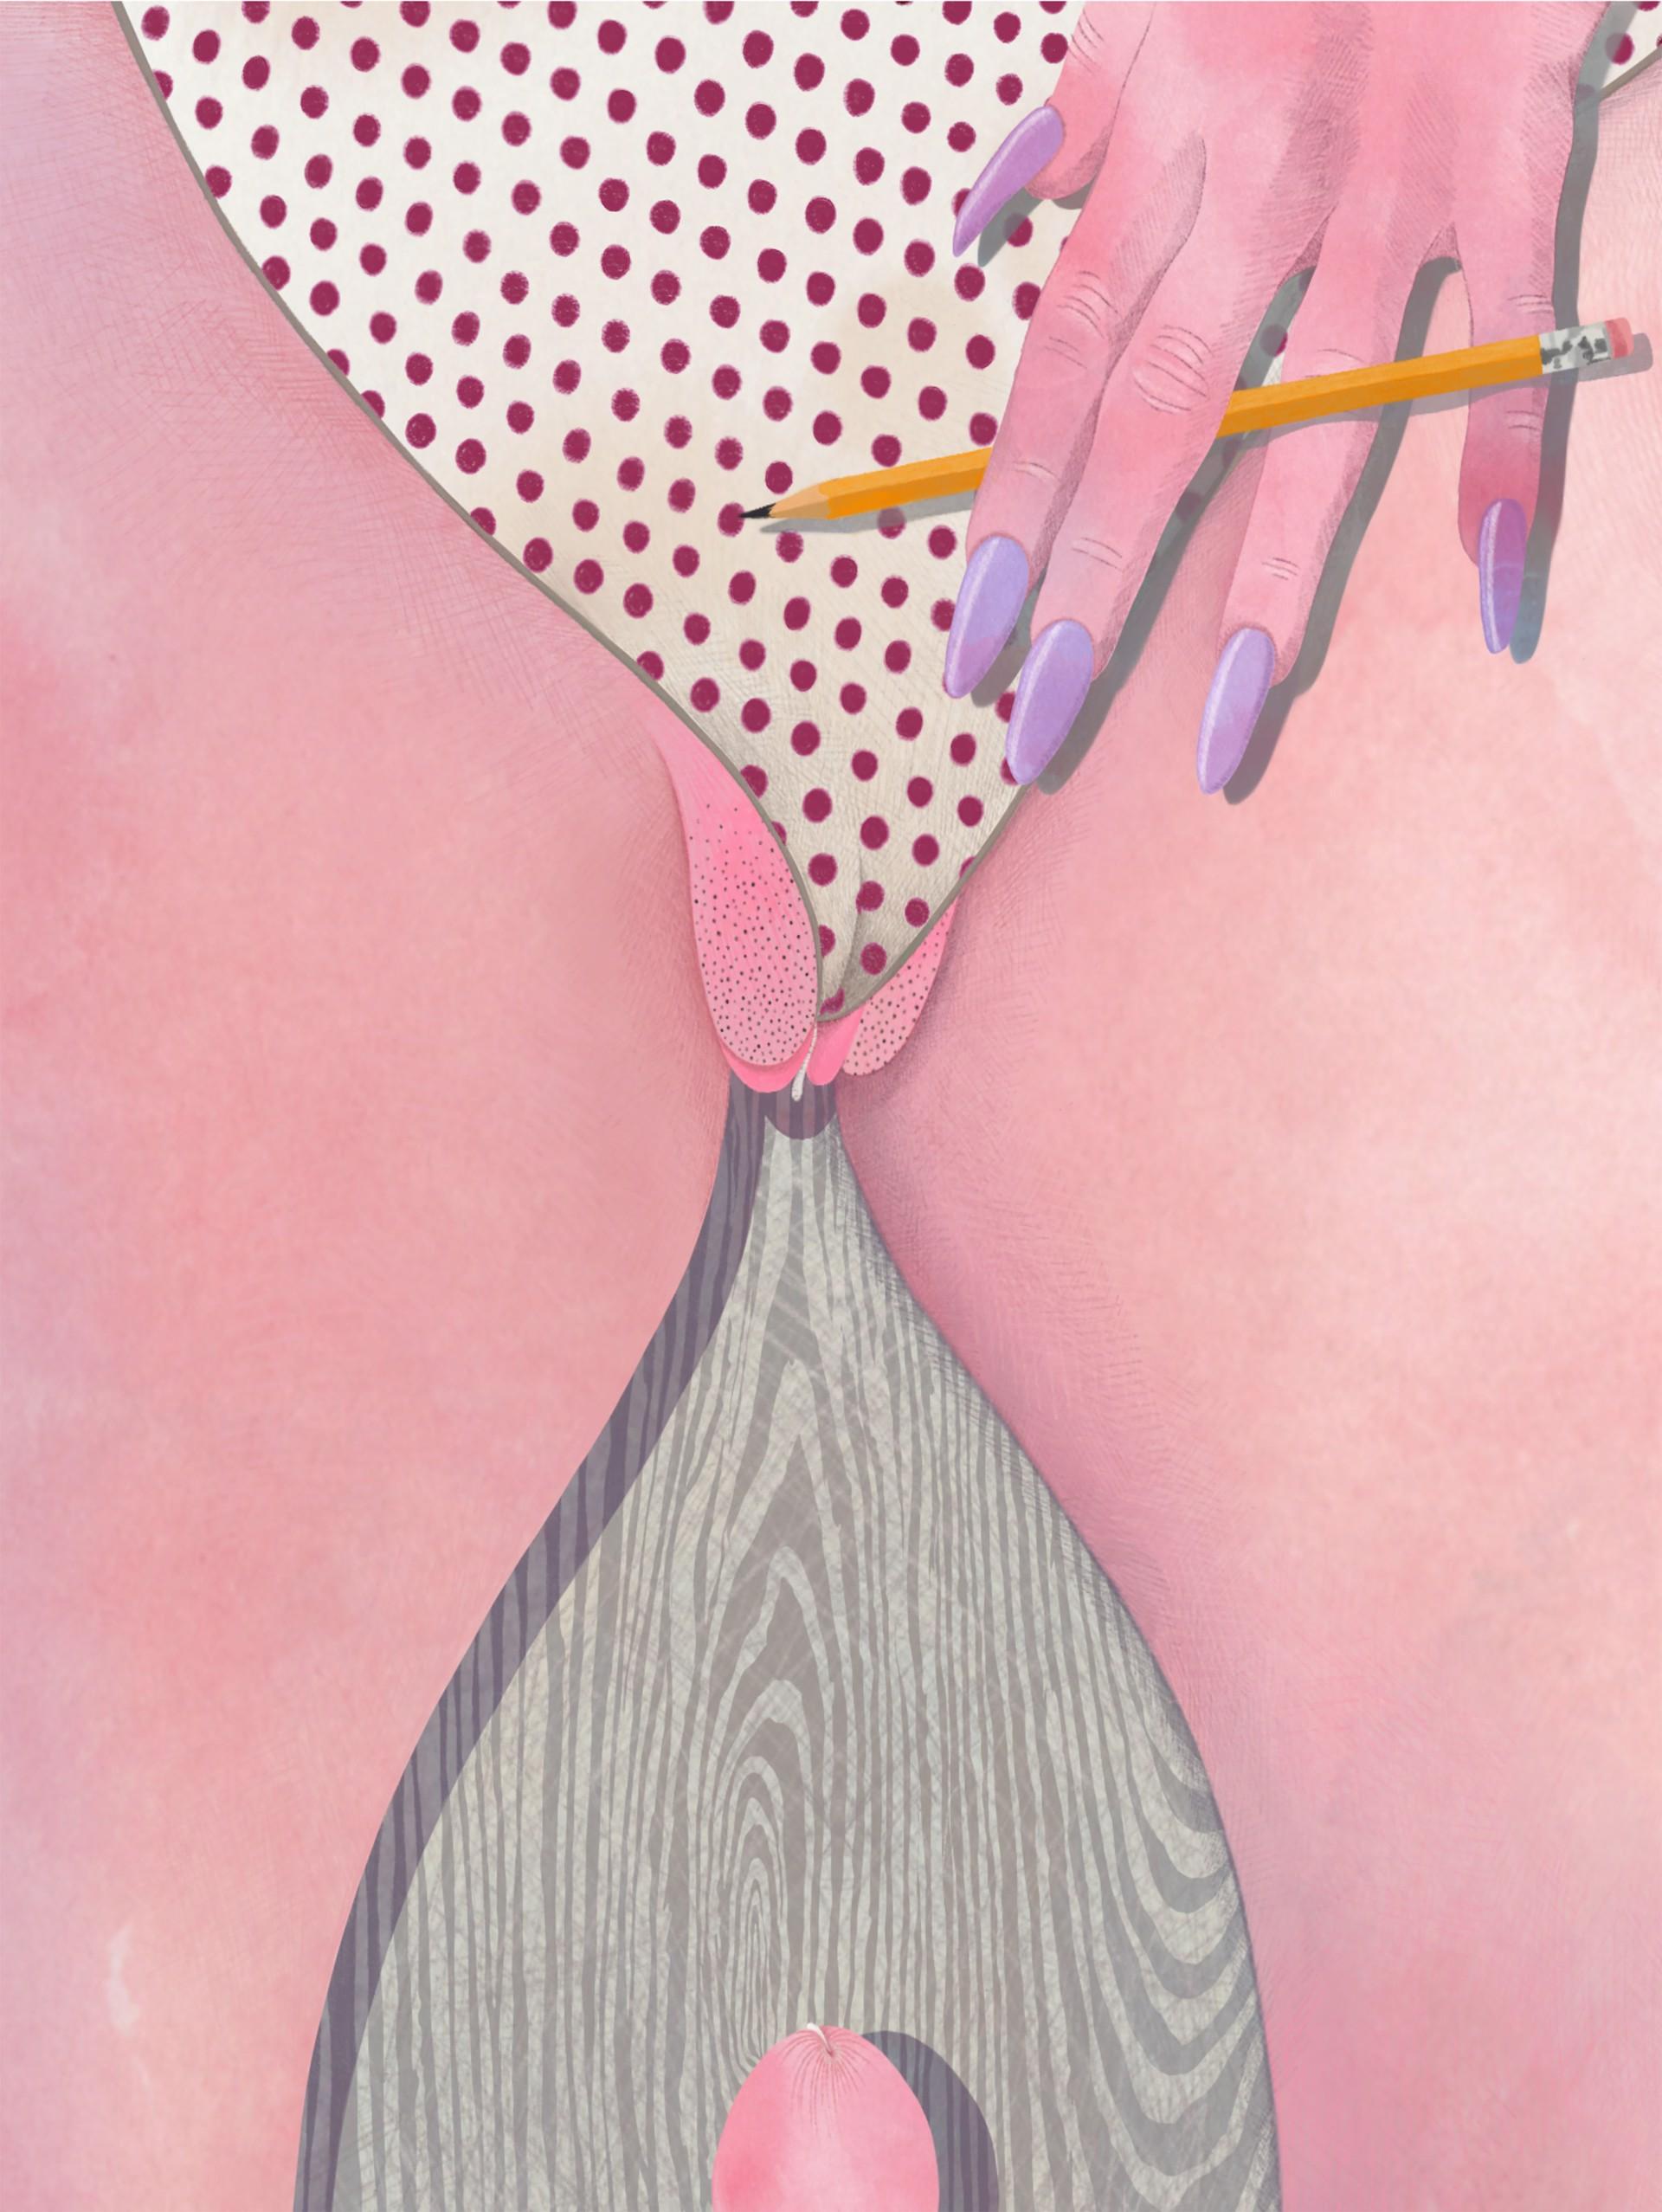 Sharp Objects by Lauren Gallaspy